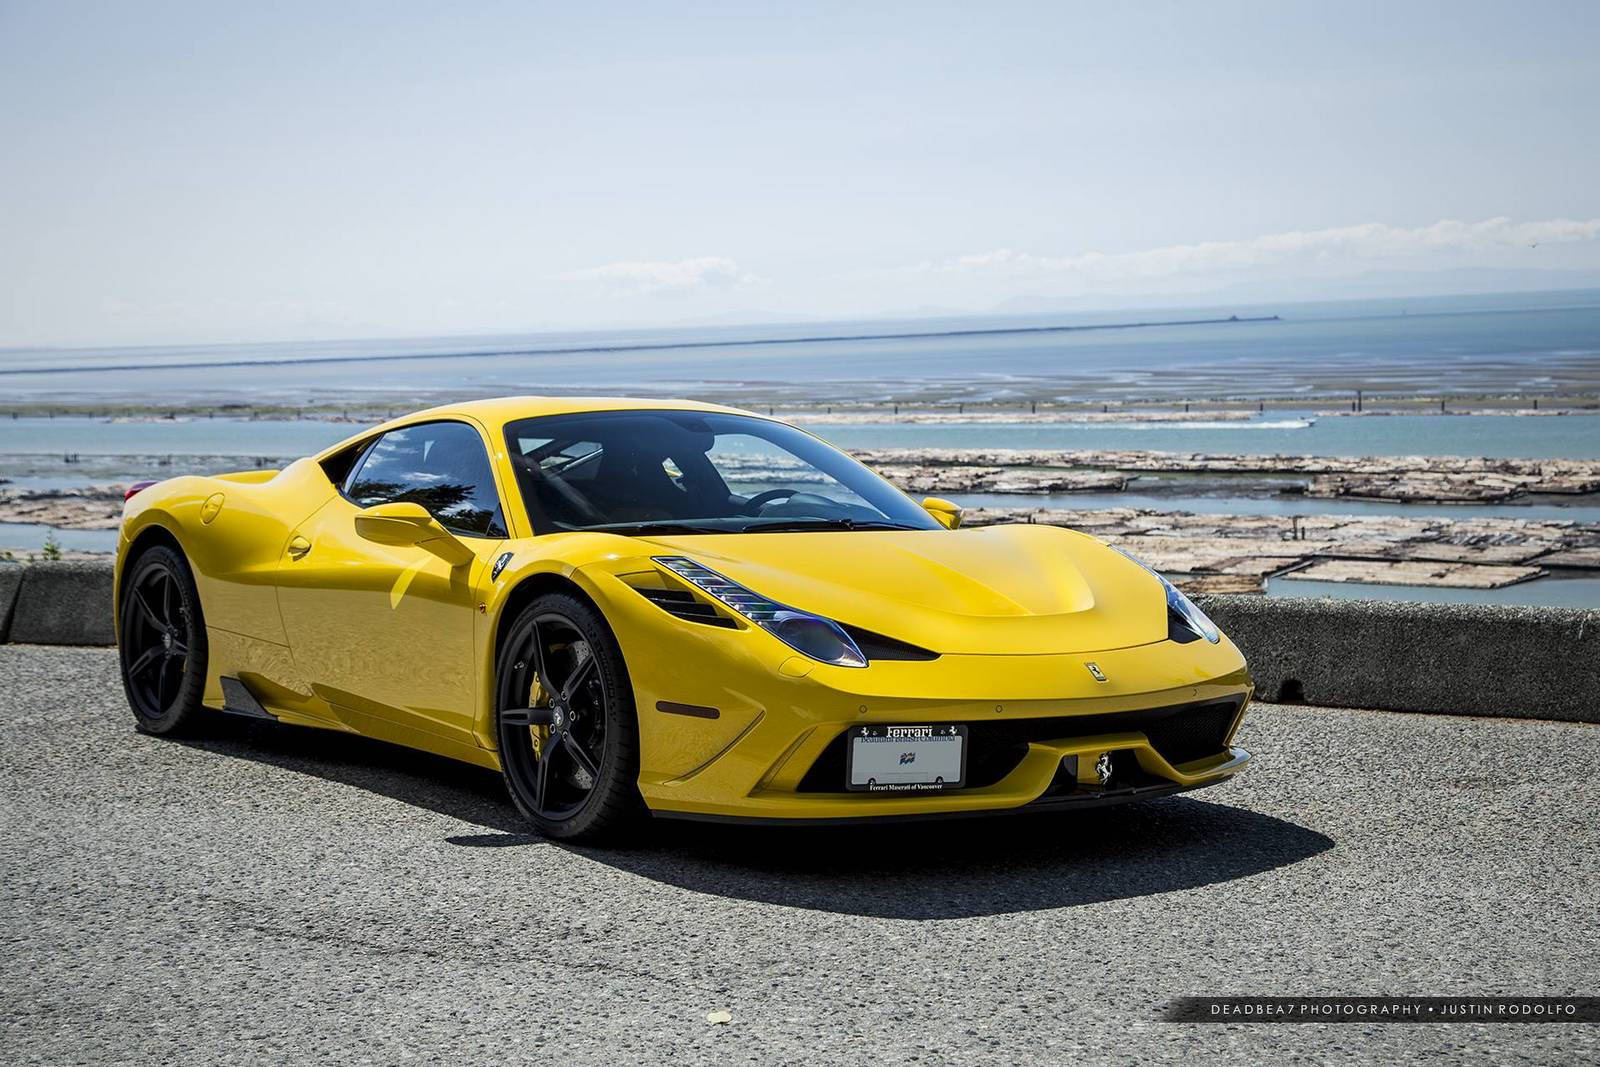 Amazing Ferrari 458 Speciale Photoshoot By The Sea Gtspirit